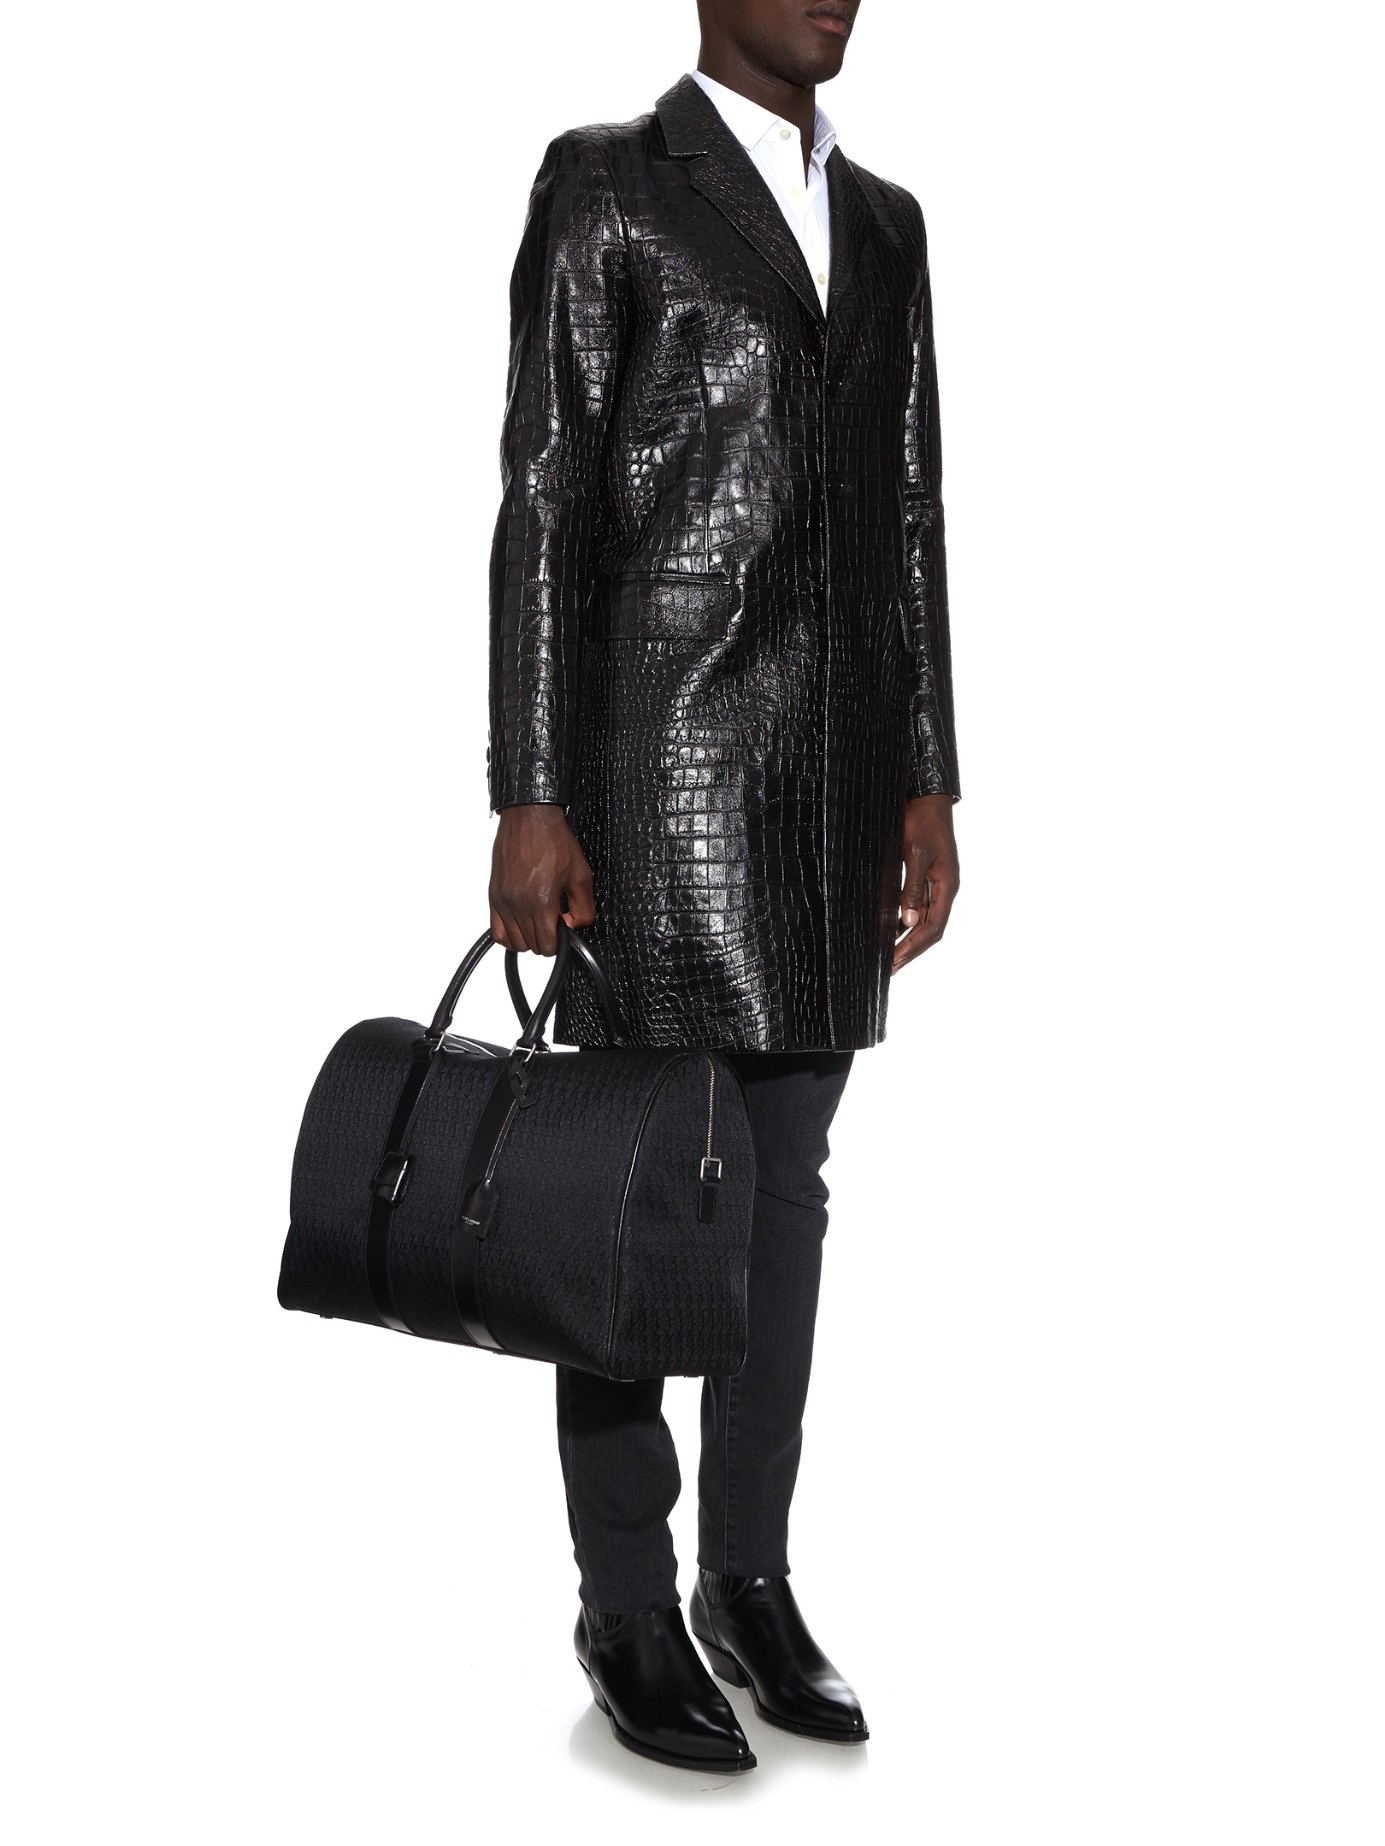 01481c52ce9a Lyst - Saint Laurent Jacquard Weekend Bag in Black for Men